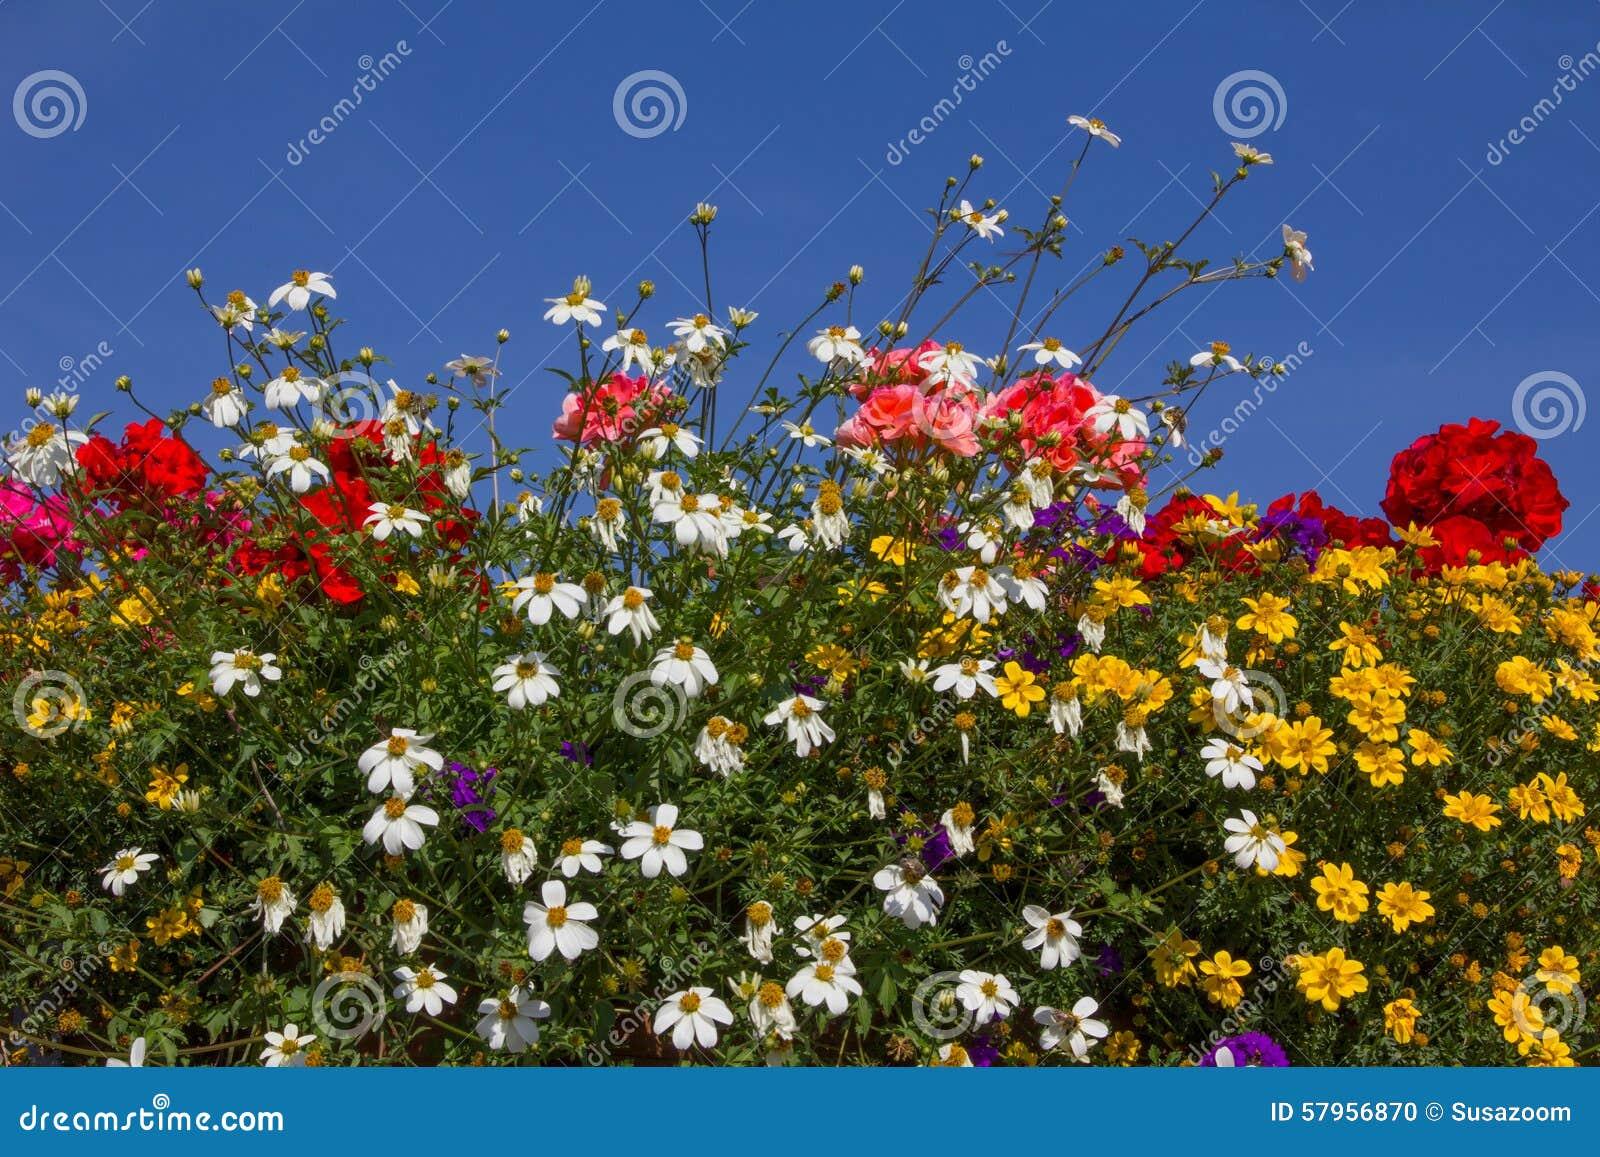 Balcony With Colorful Summer Flowers Geranium Yellow Bidens Stock